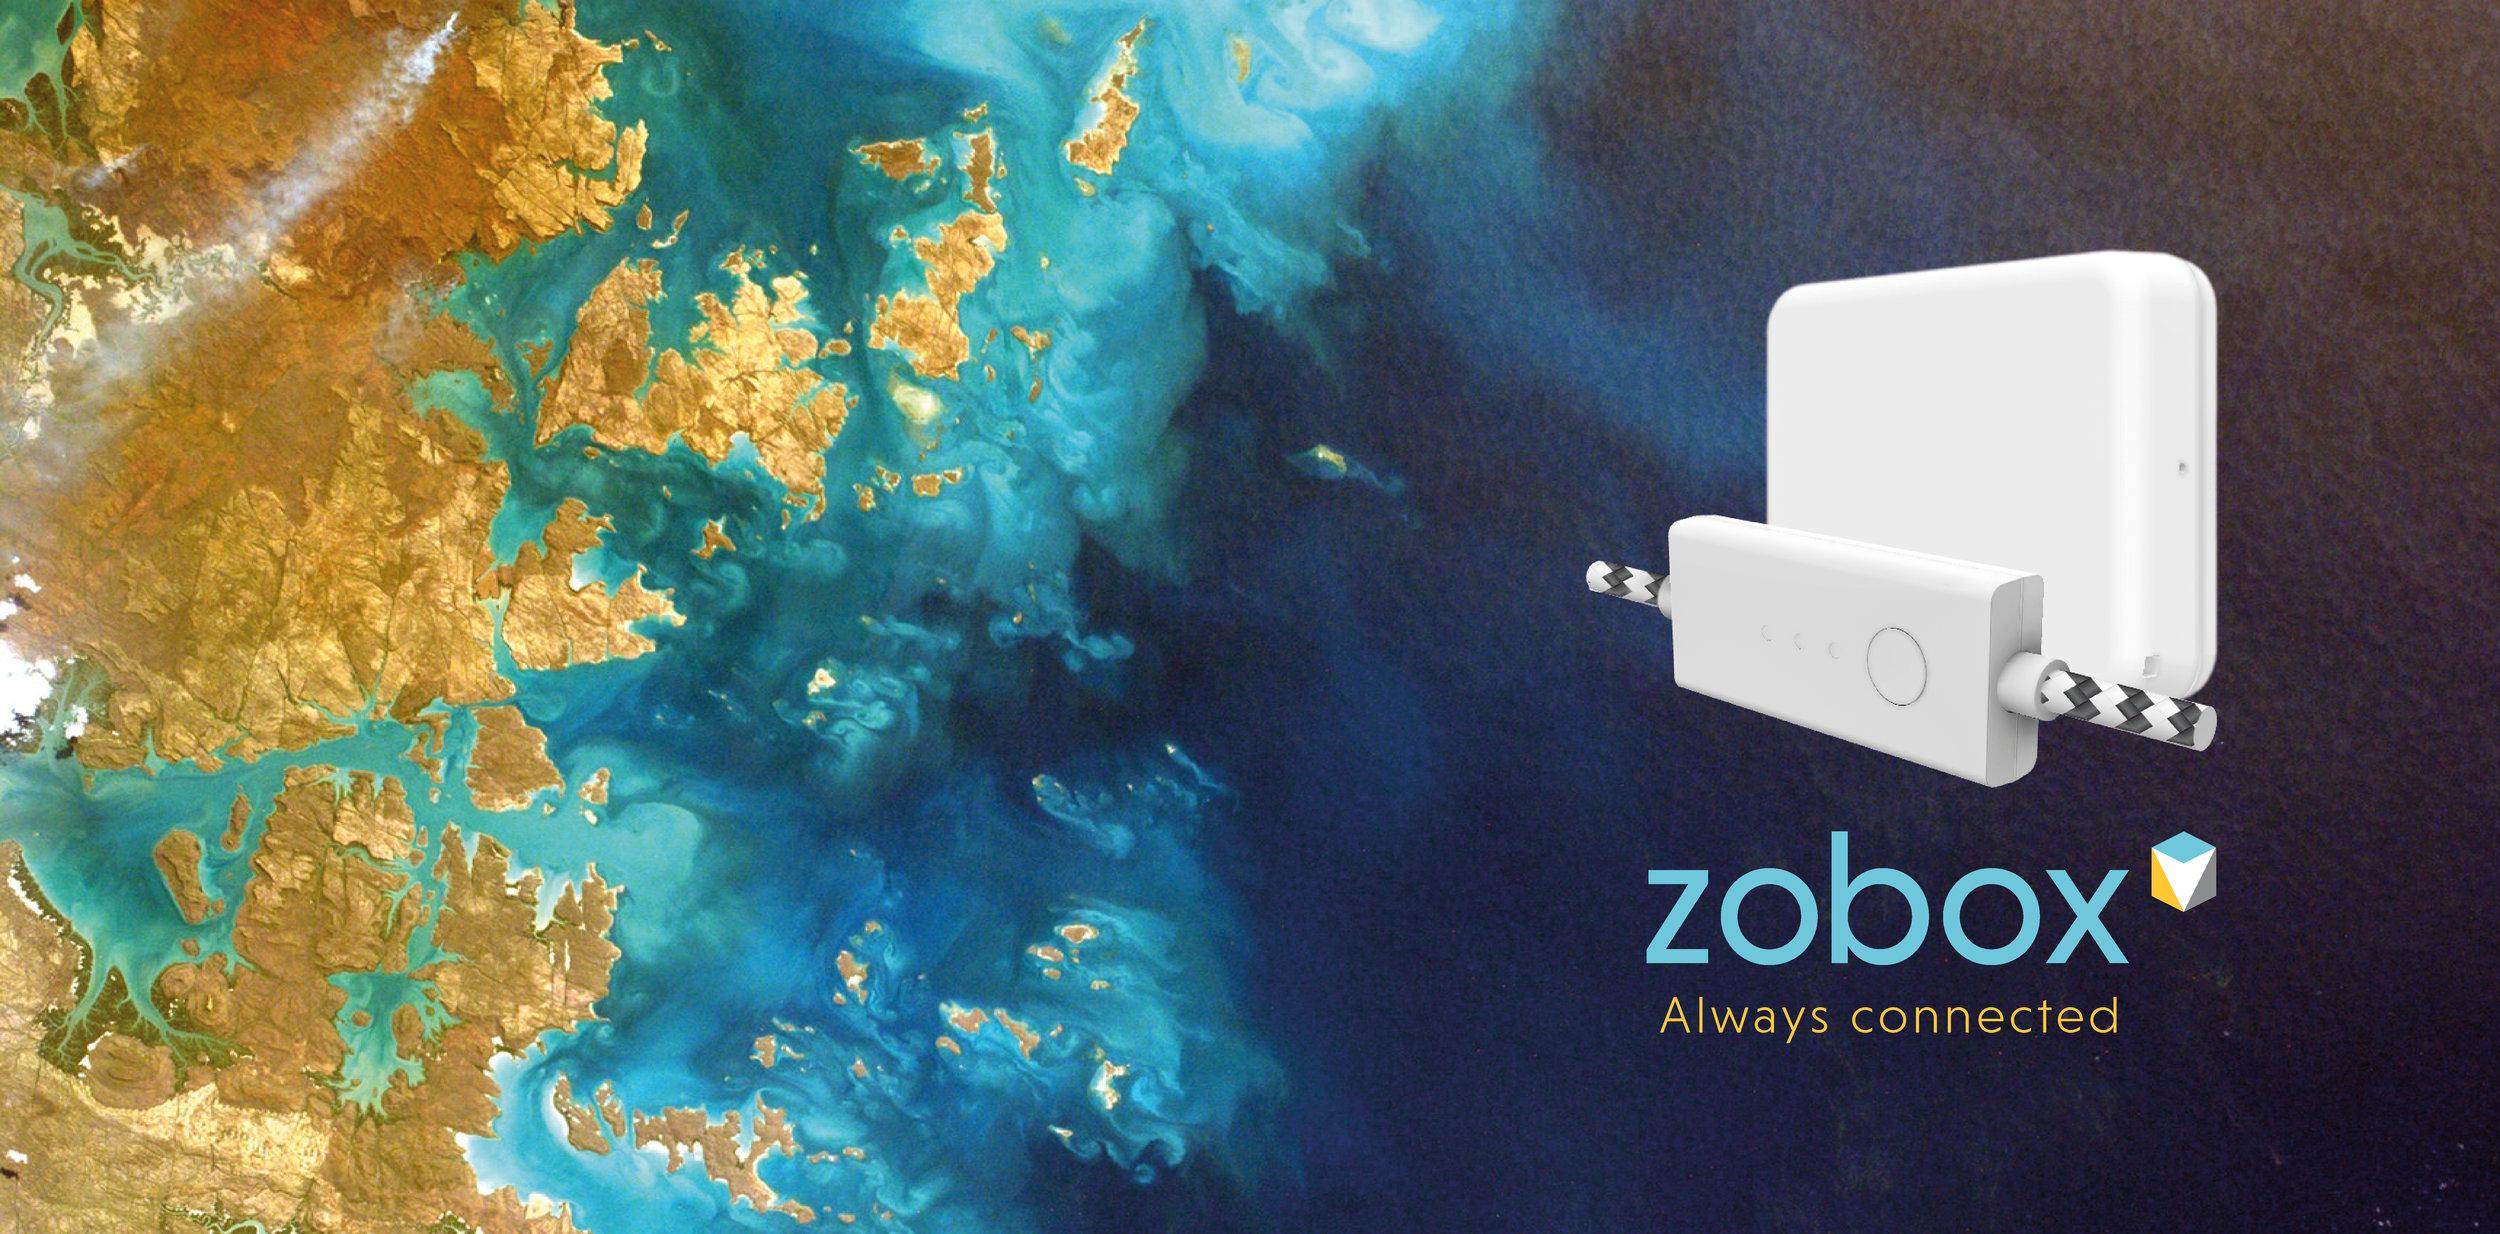 zobox1.jpg